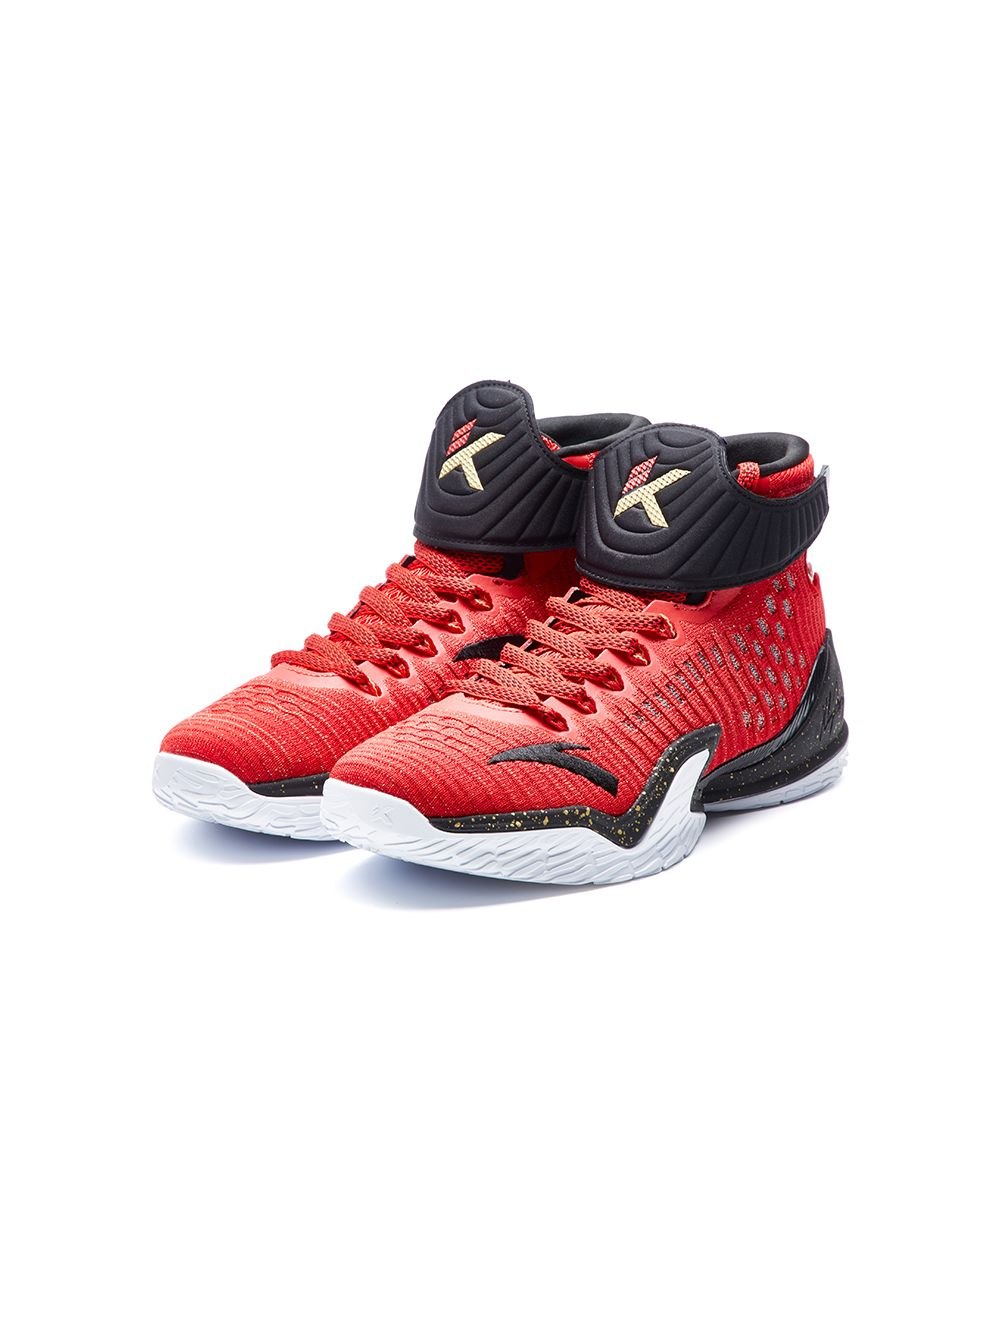 "Anta 2021 New Nba Klay Thompson Kt3 ""Christmas Wars"" Klay Thompson Shoes Kt3"